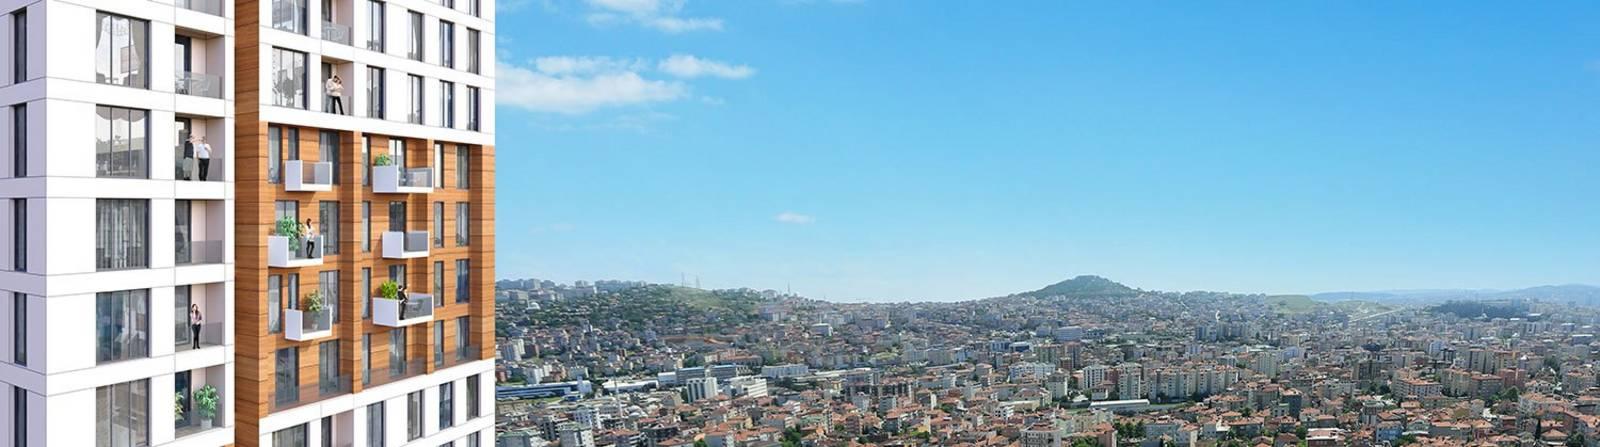 Self İstanbul